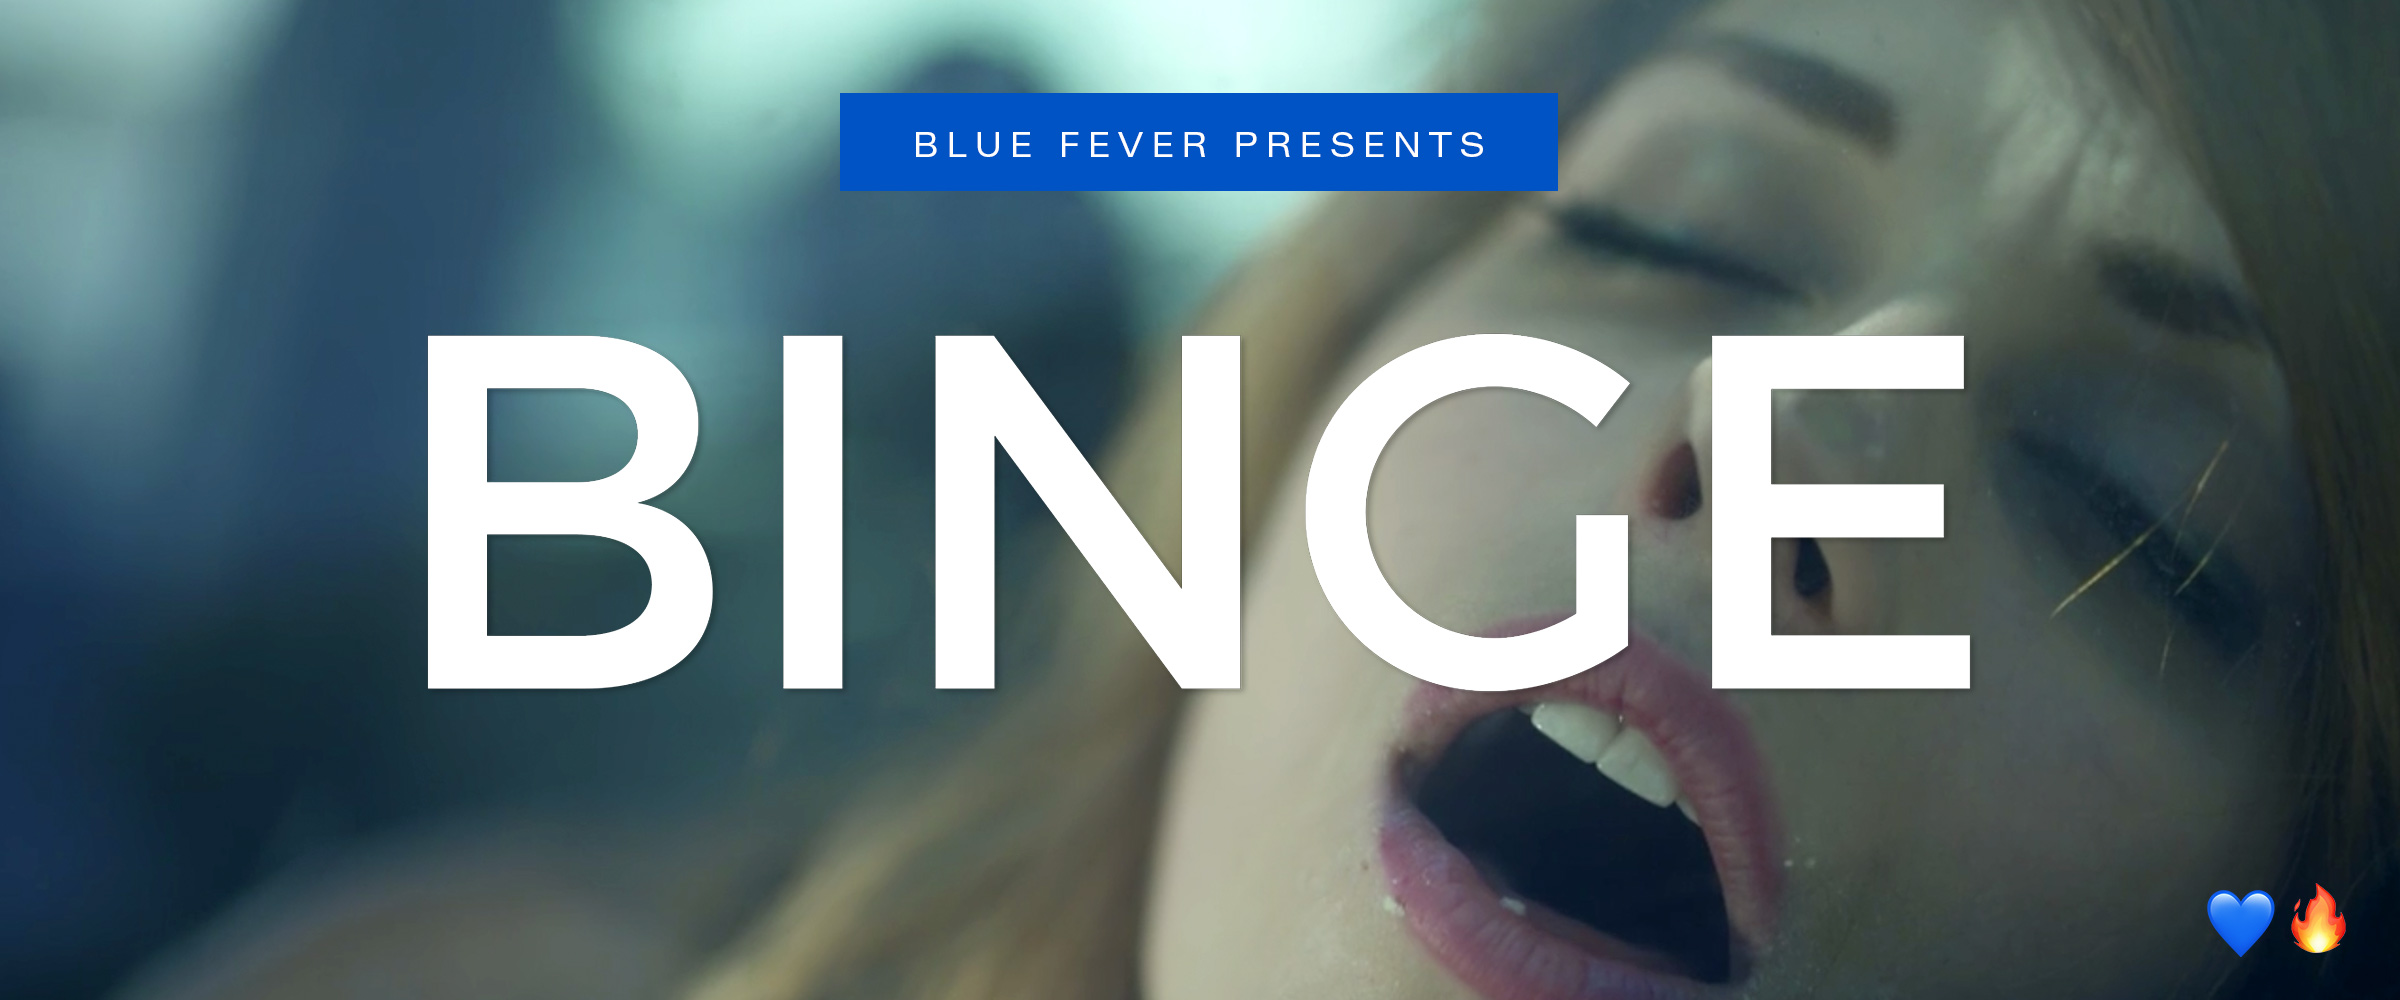 BINGE-Featured.jpg